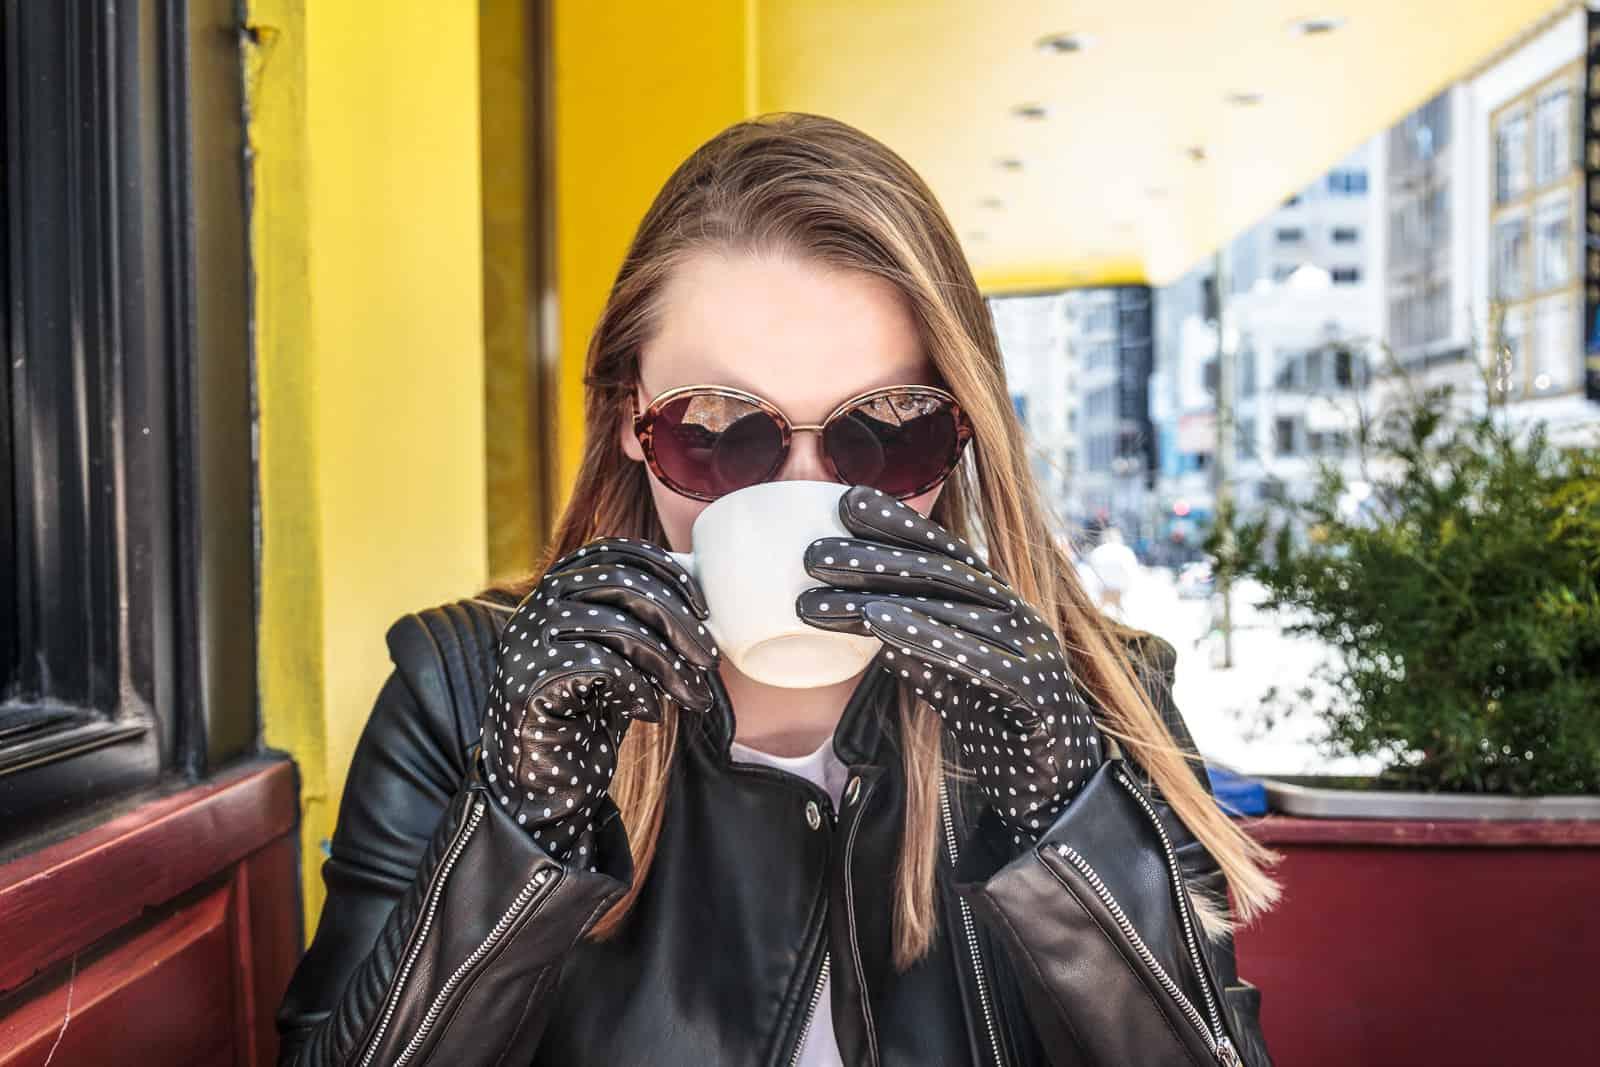 beau-gant-gloves-polka-dot-gloves-black-white-fashion